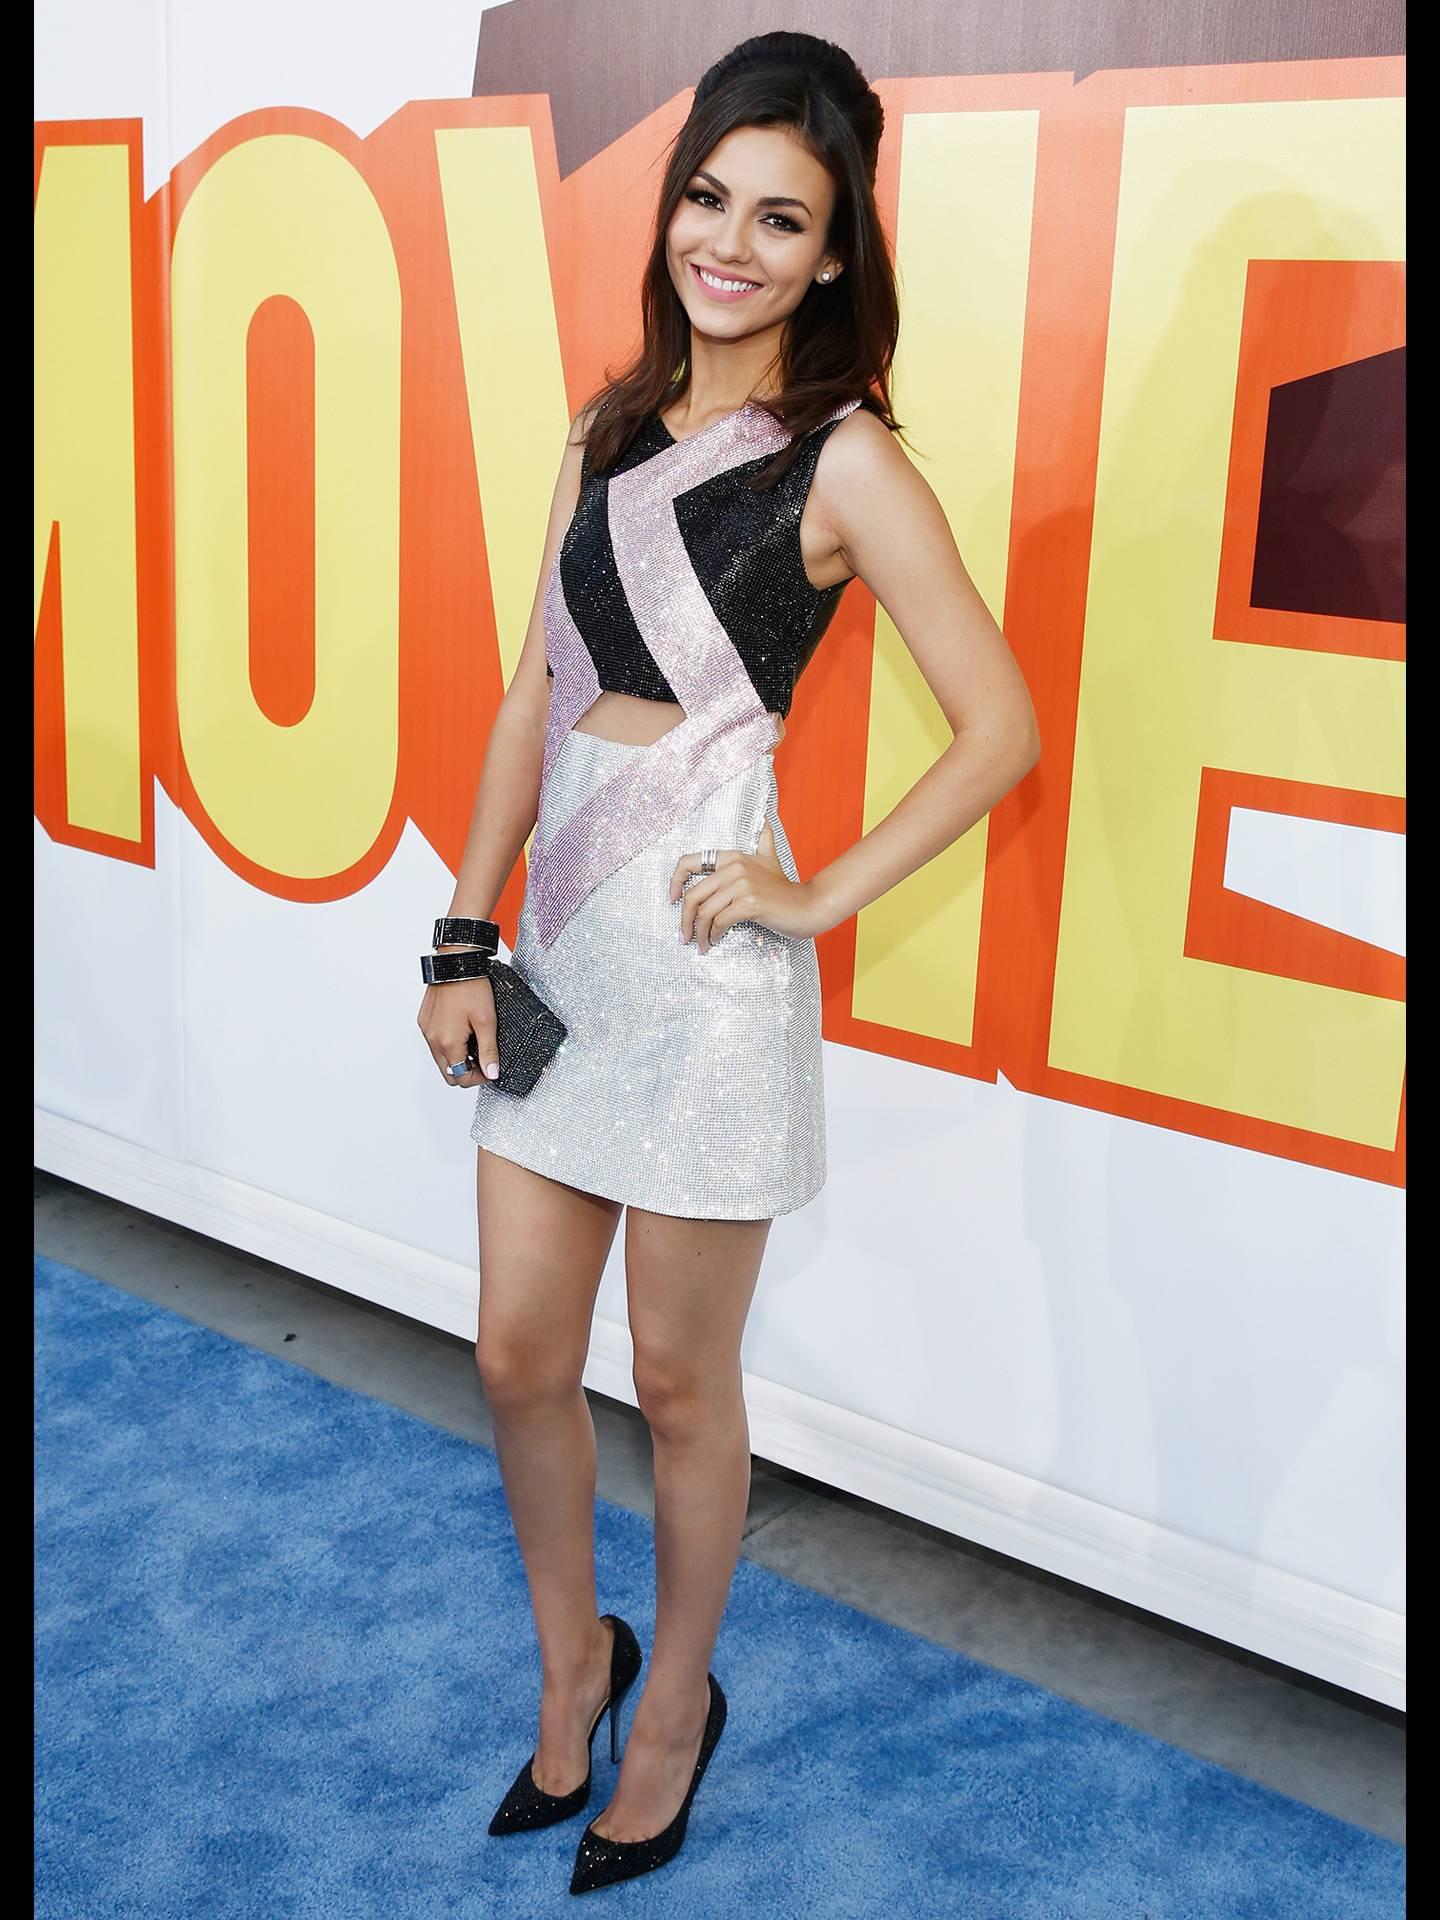 mgid:file:gsp:scenic:/international/mtv-intl/mtv-movie-awards-2015/images/VictoriaJustice-469508436.jpg